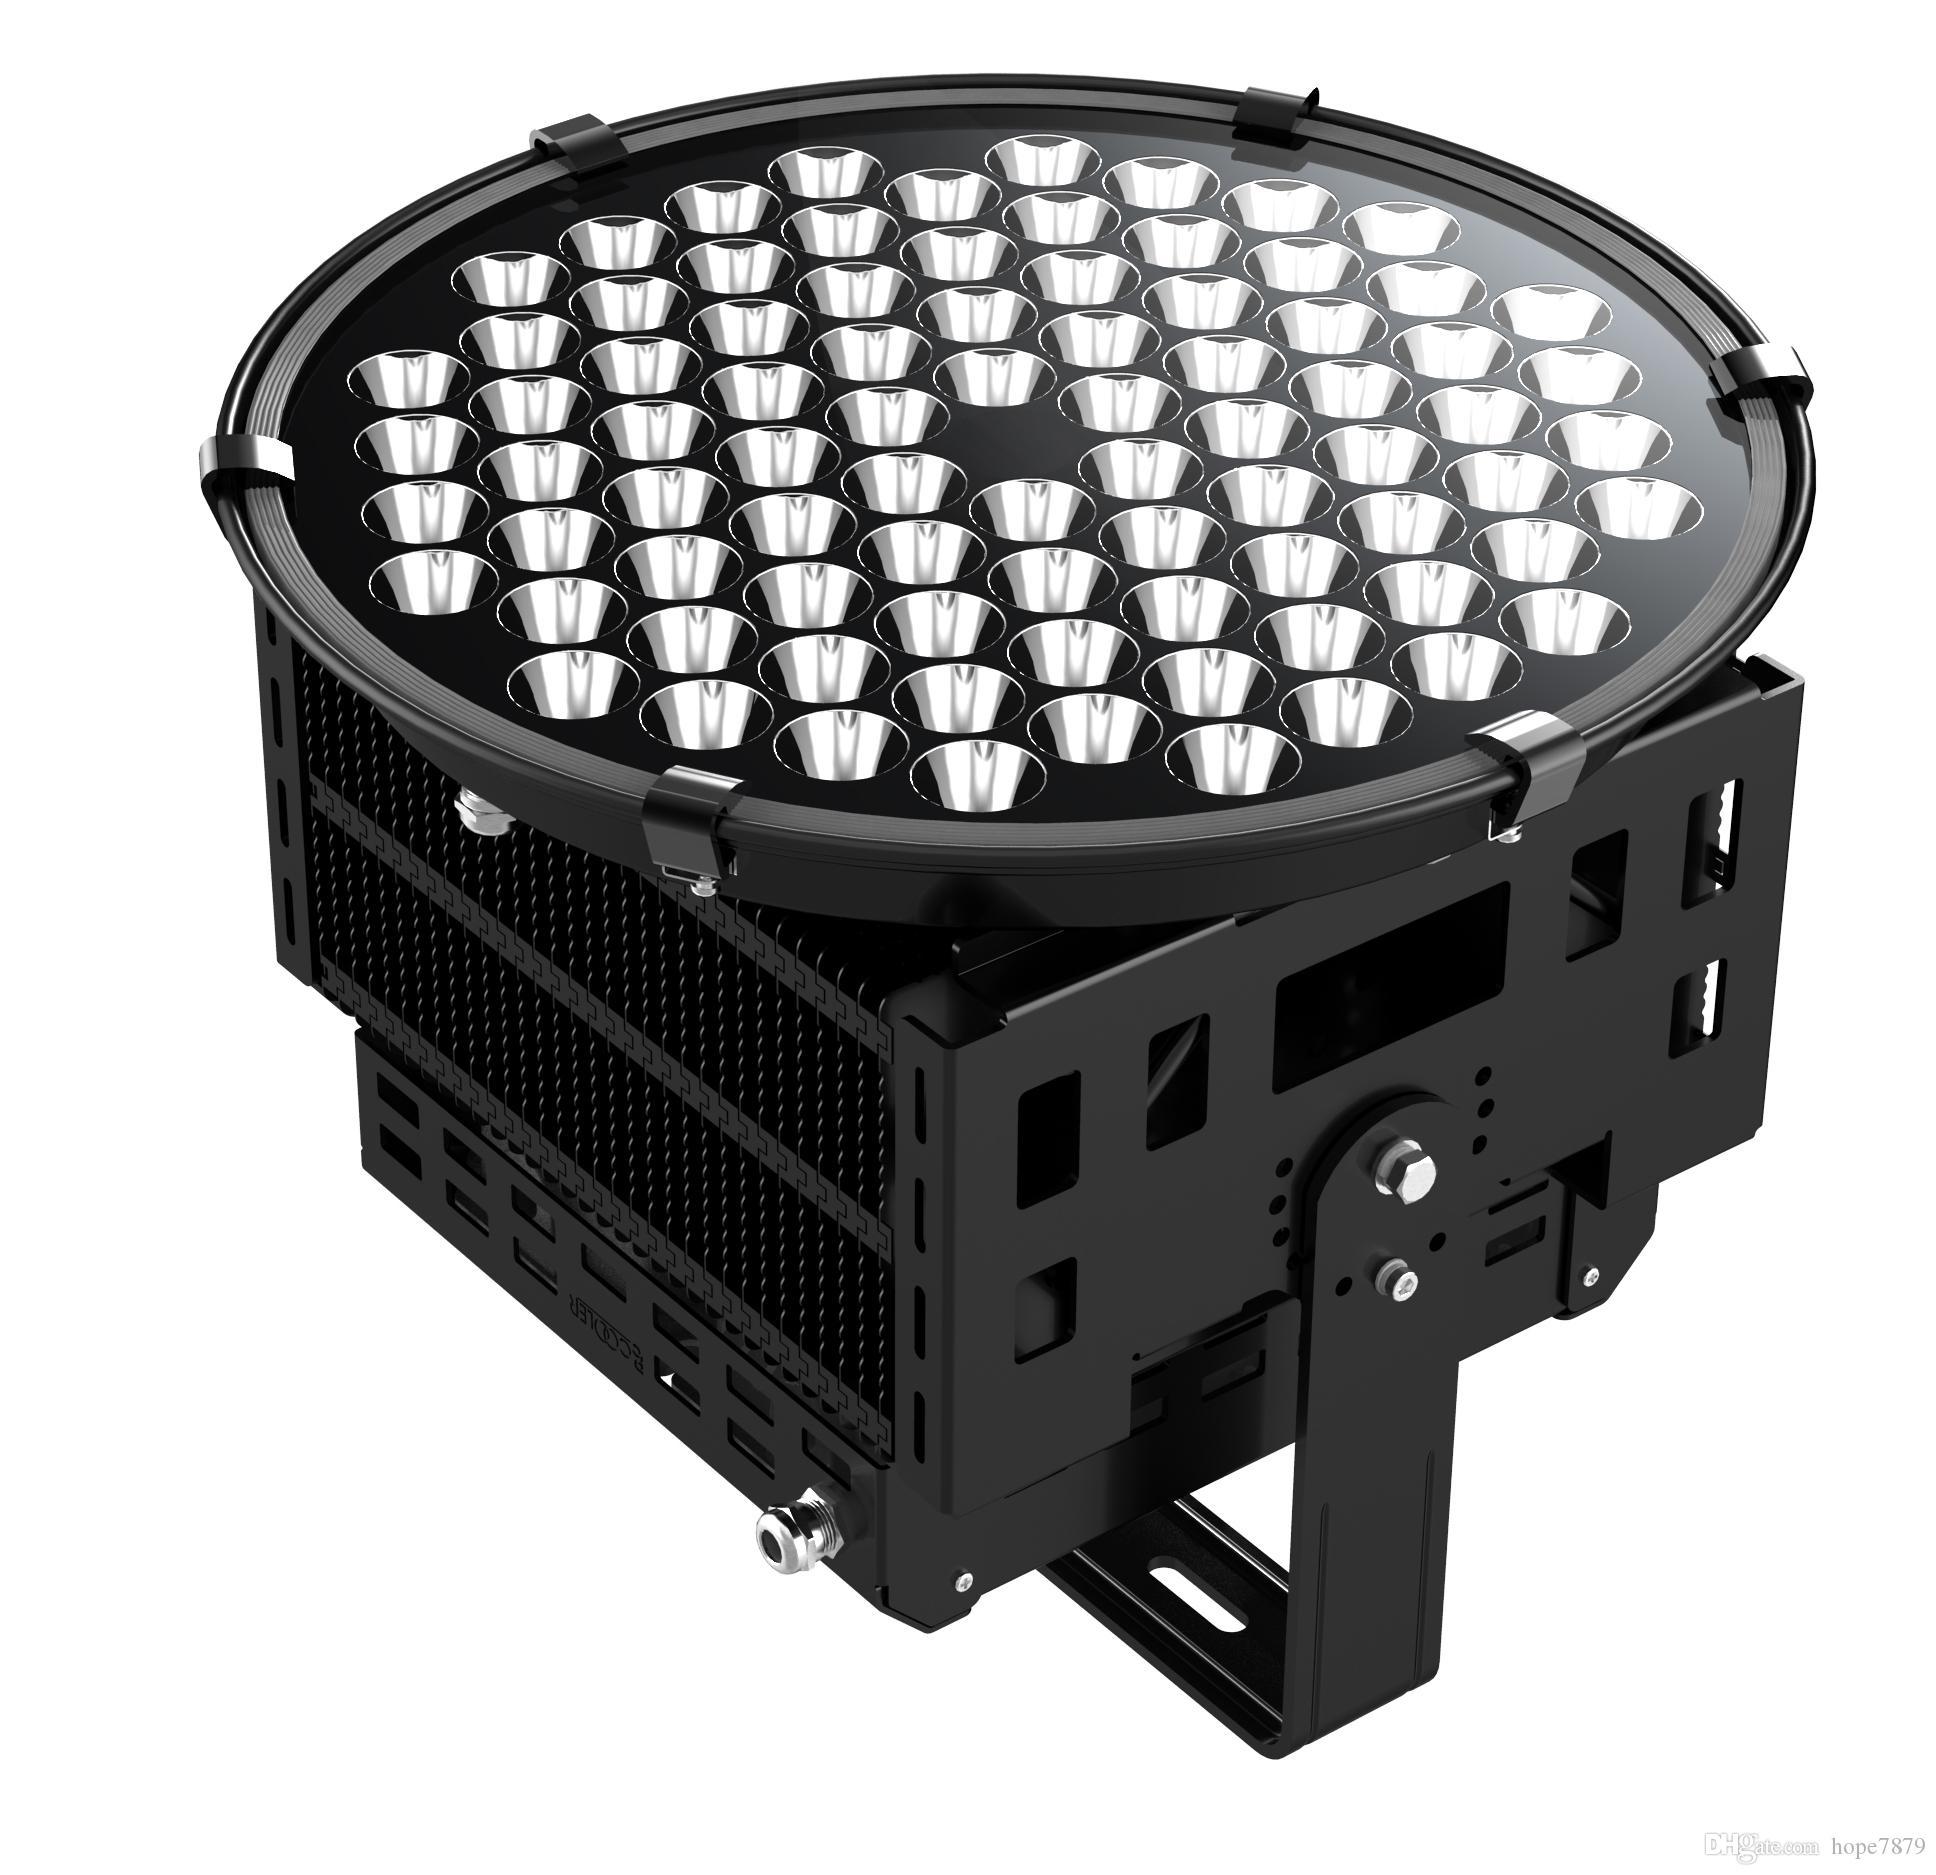 500W high mast lighting stadium soccer floodlights football pitch lighting halogen replacement 3D heat dissipation FIN housing